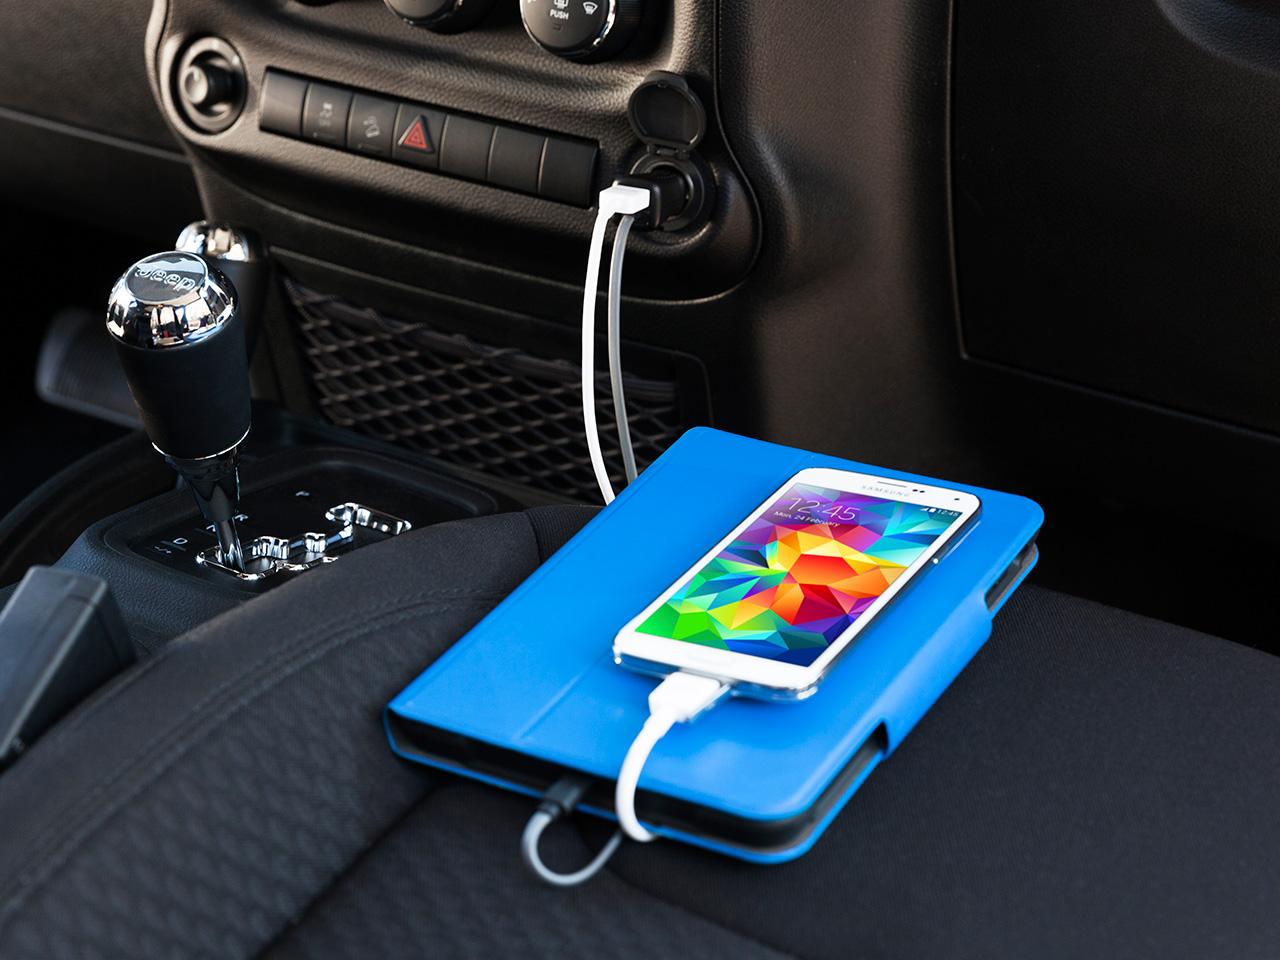 PowerJolt Dual Car Charger with Lightning Connector 12 Watt